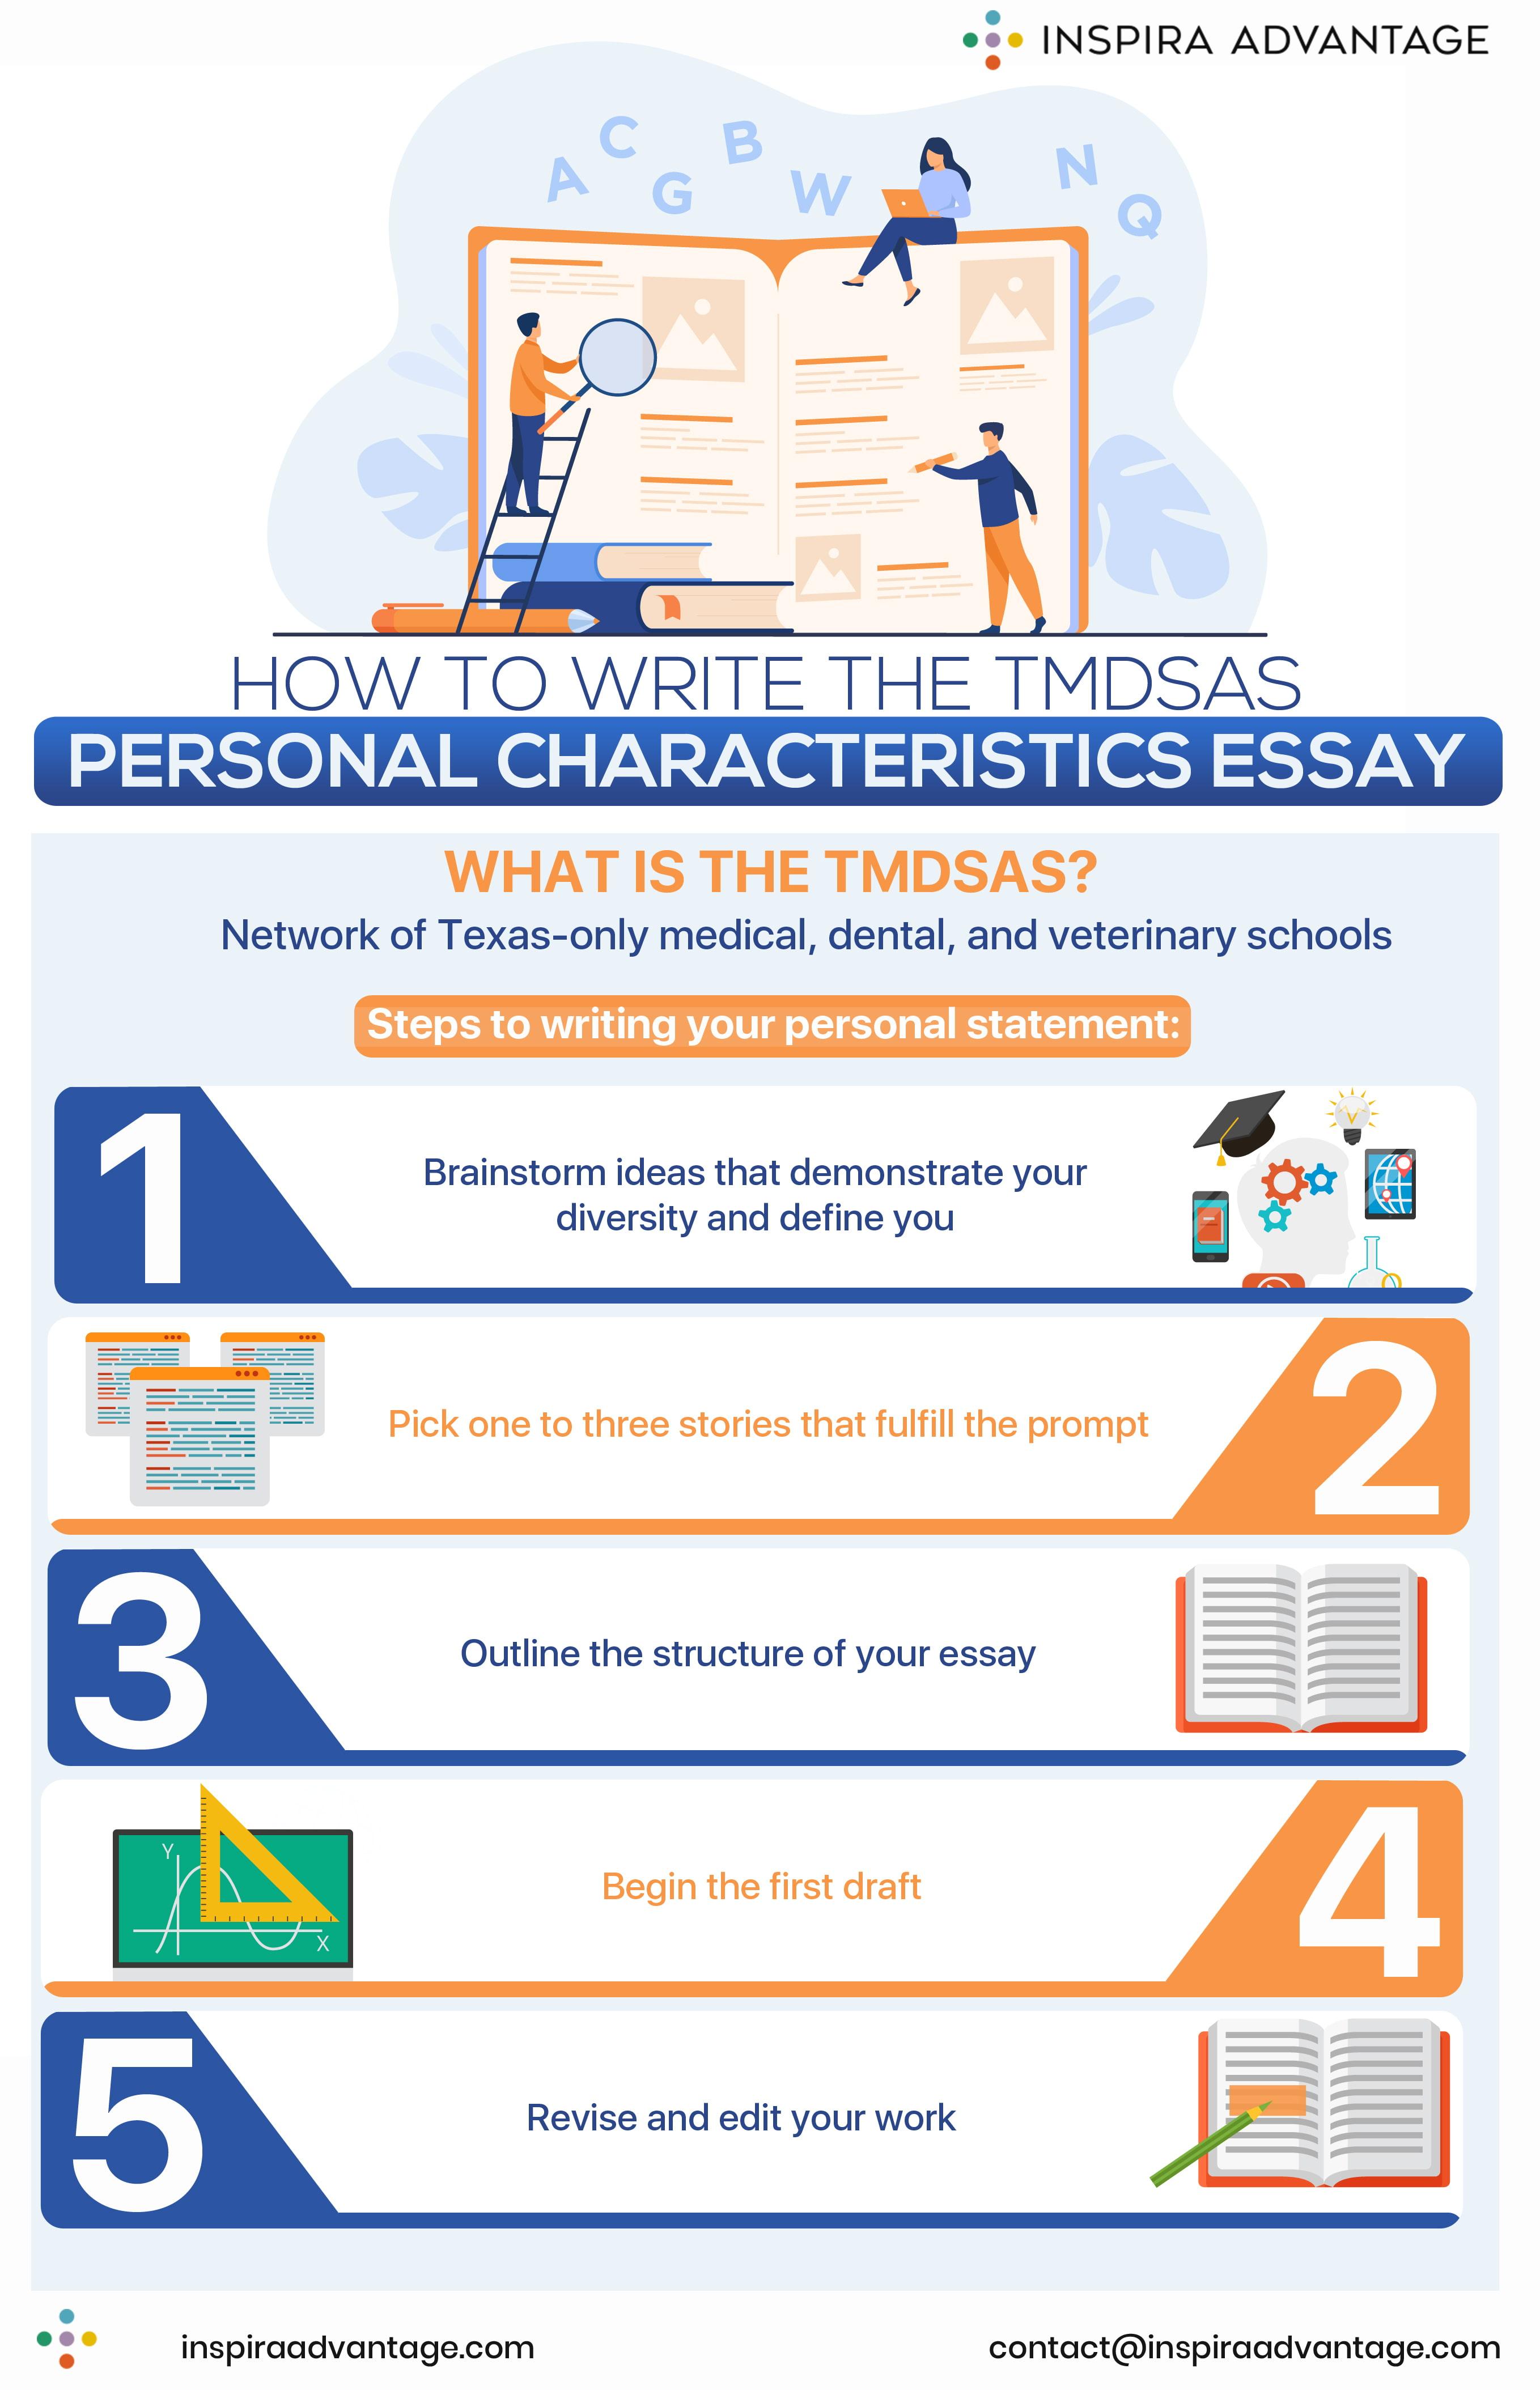 How to write the TMDSAS characteristics essay